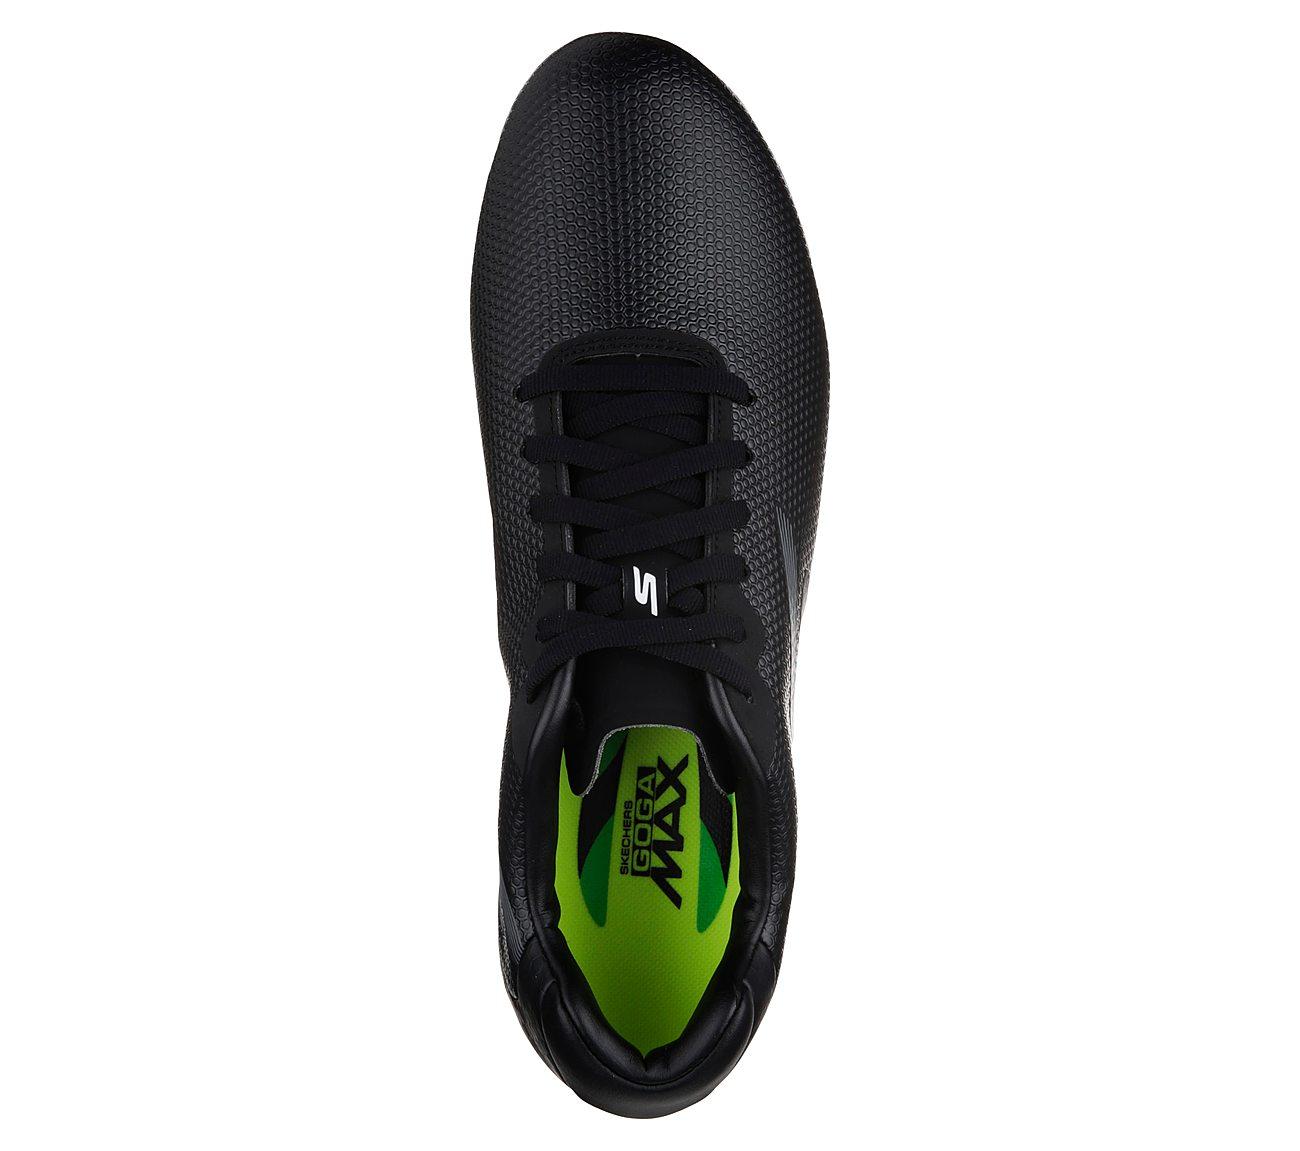 88d0ae61bba Buy SKECHERS Skechers Performance - Soccer Skechers Performance ...